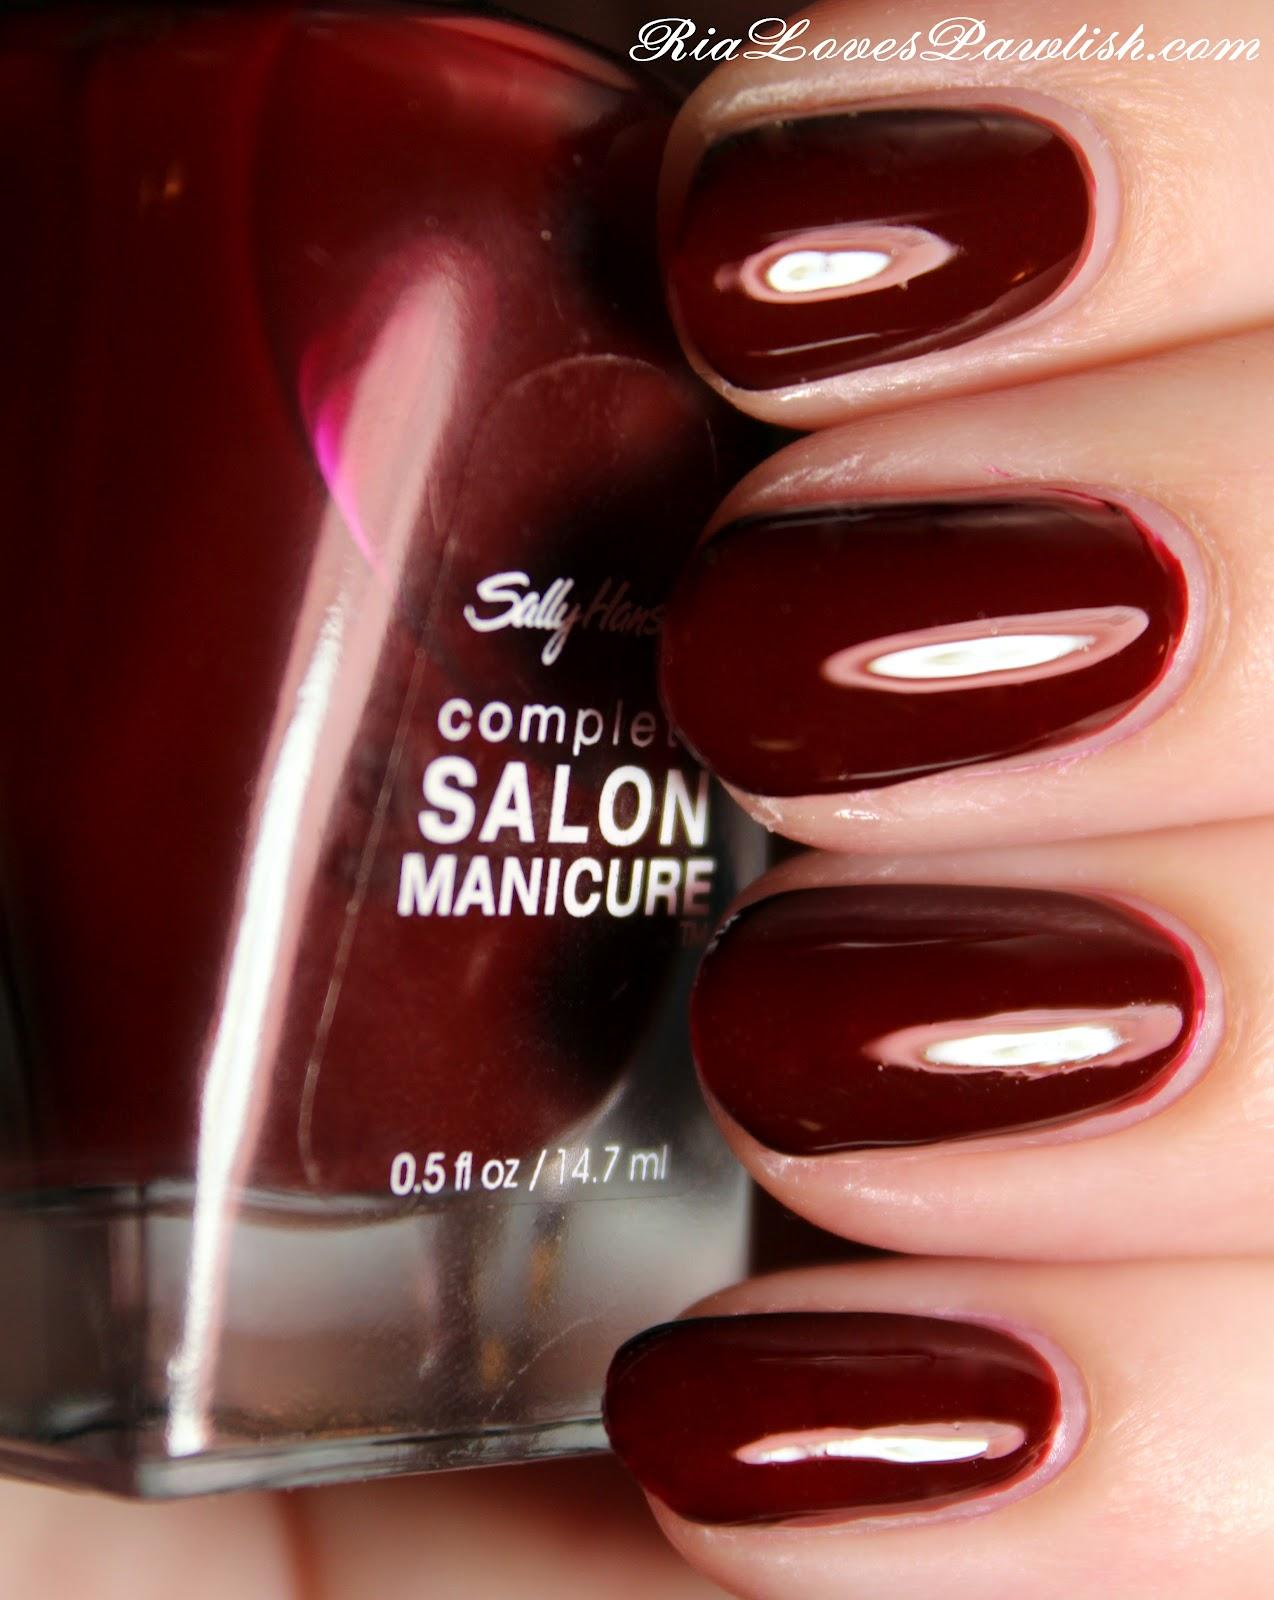 ria loves pawlish sally hansen complete salon manicure. Black Bedroom Furniture Sets. Home Design Ideas